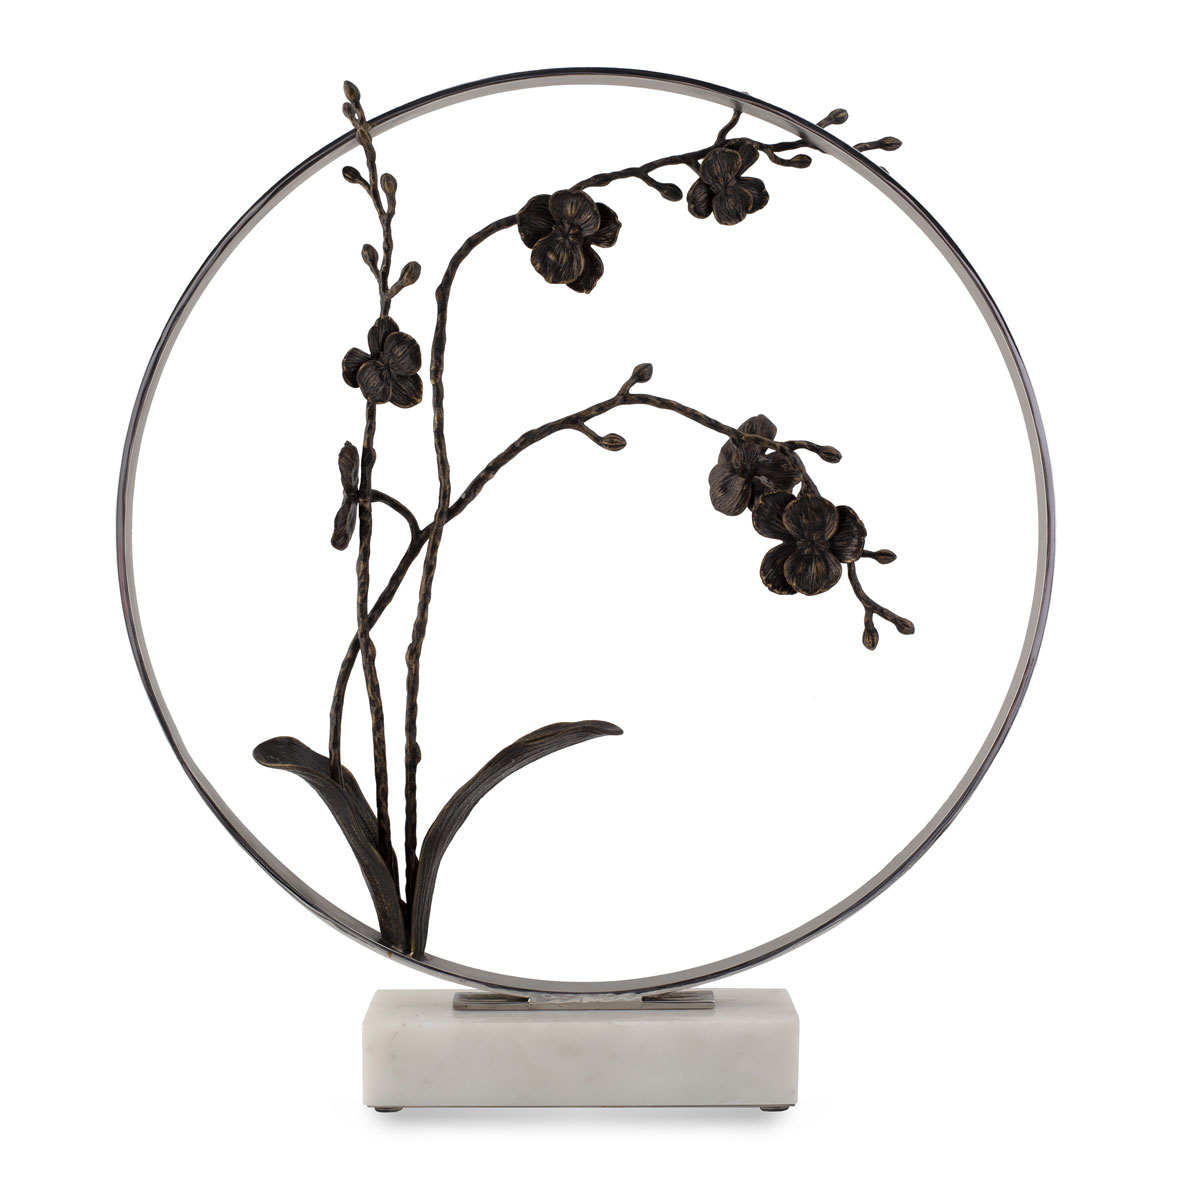 "Michael Aram Black Orchid 22"" Moon Gate Sculpture, Limited Edition"